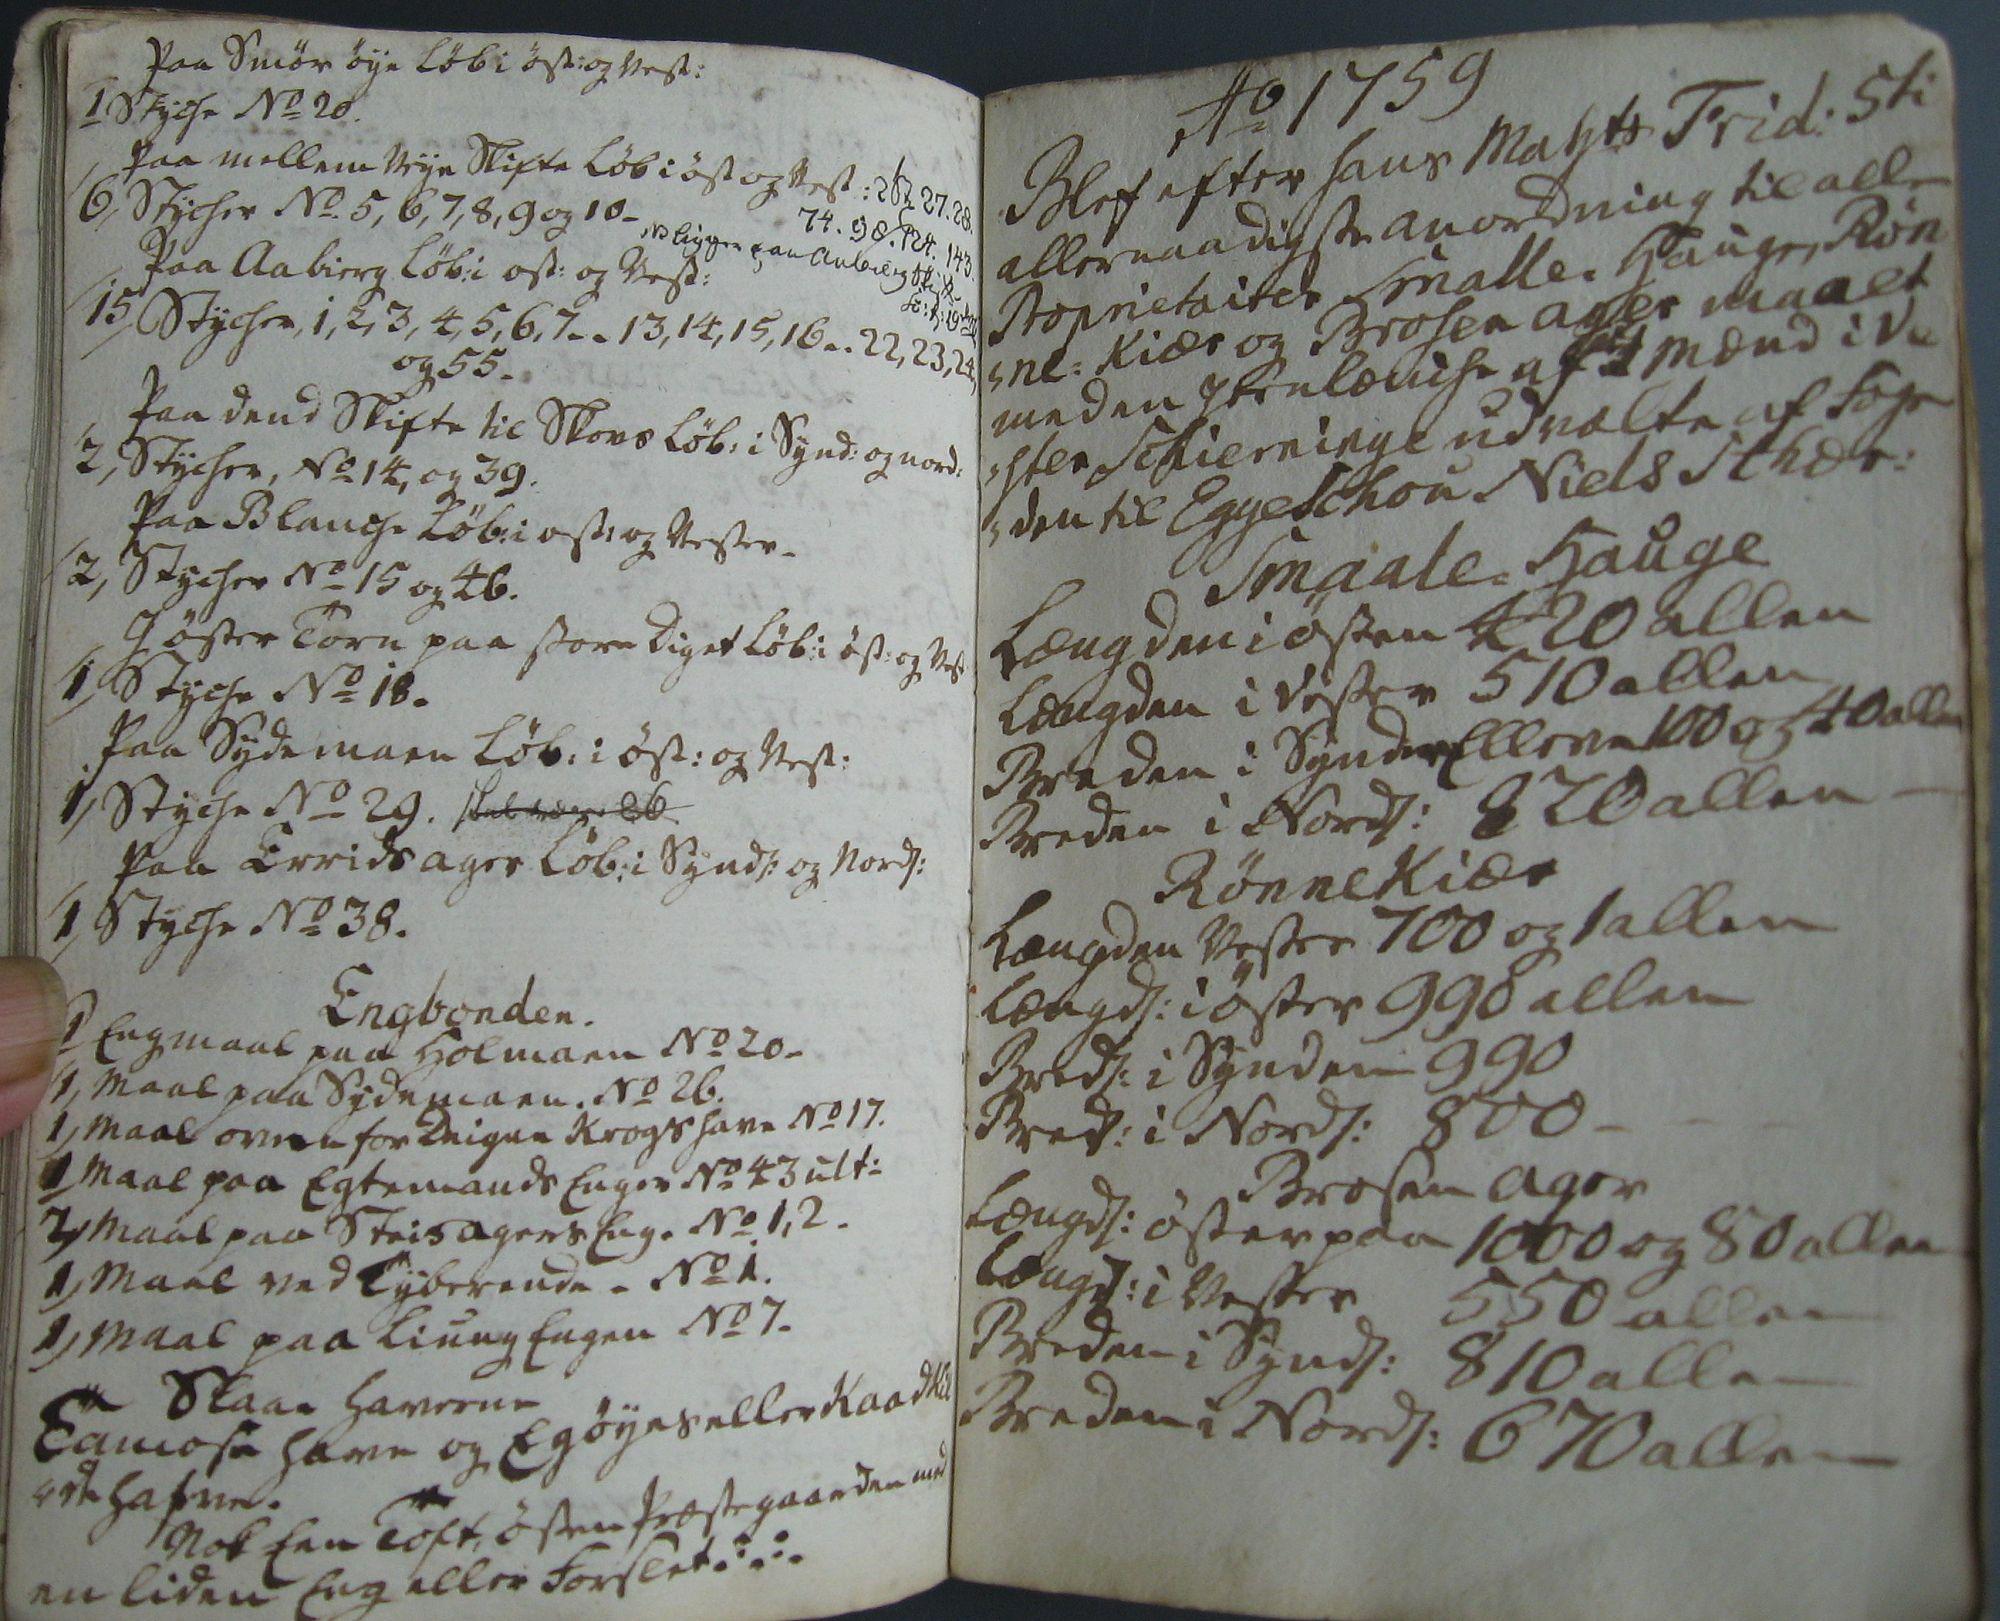 Lauritz Cruchow 1755 (21)